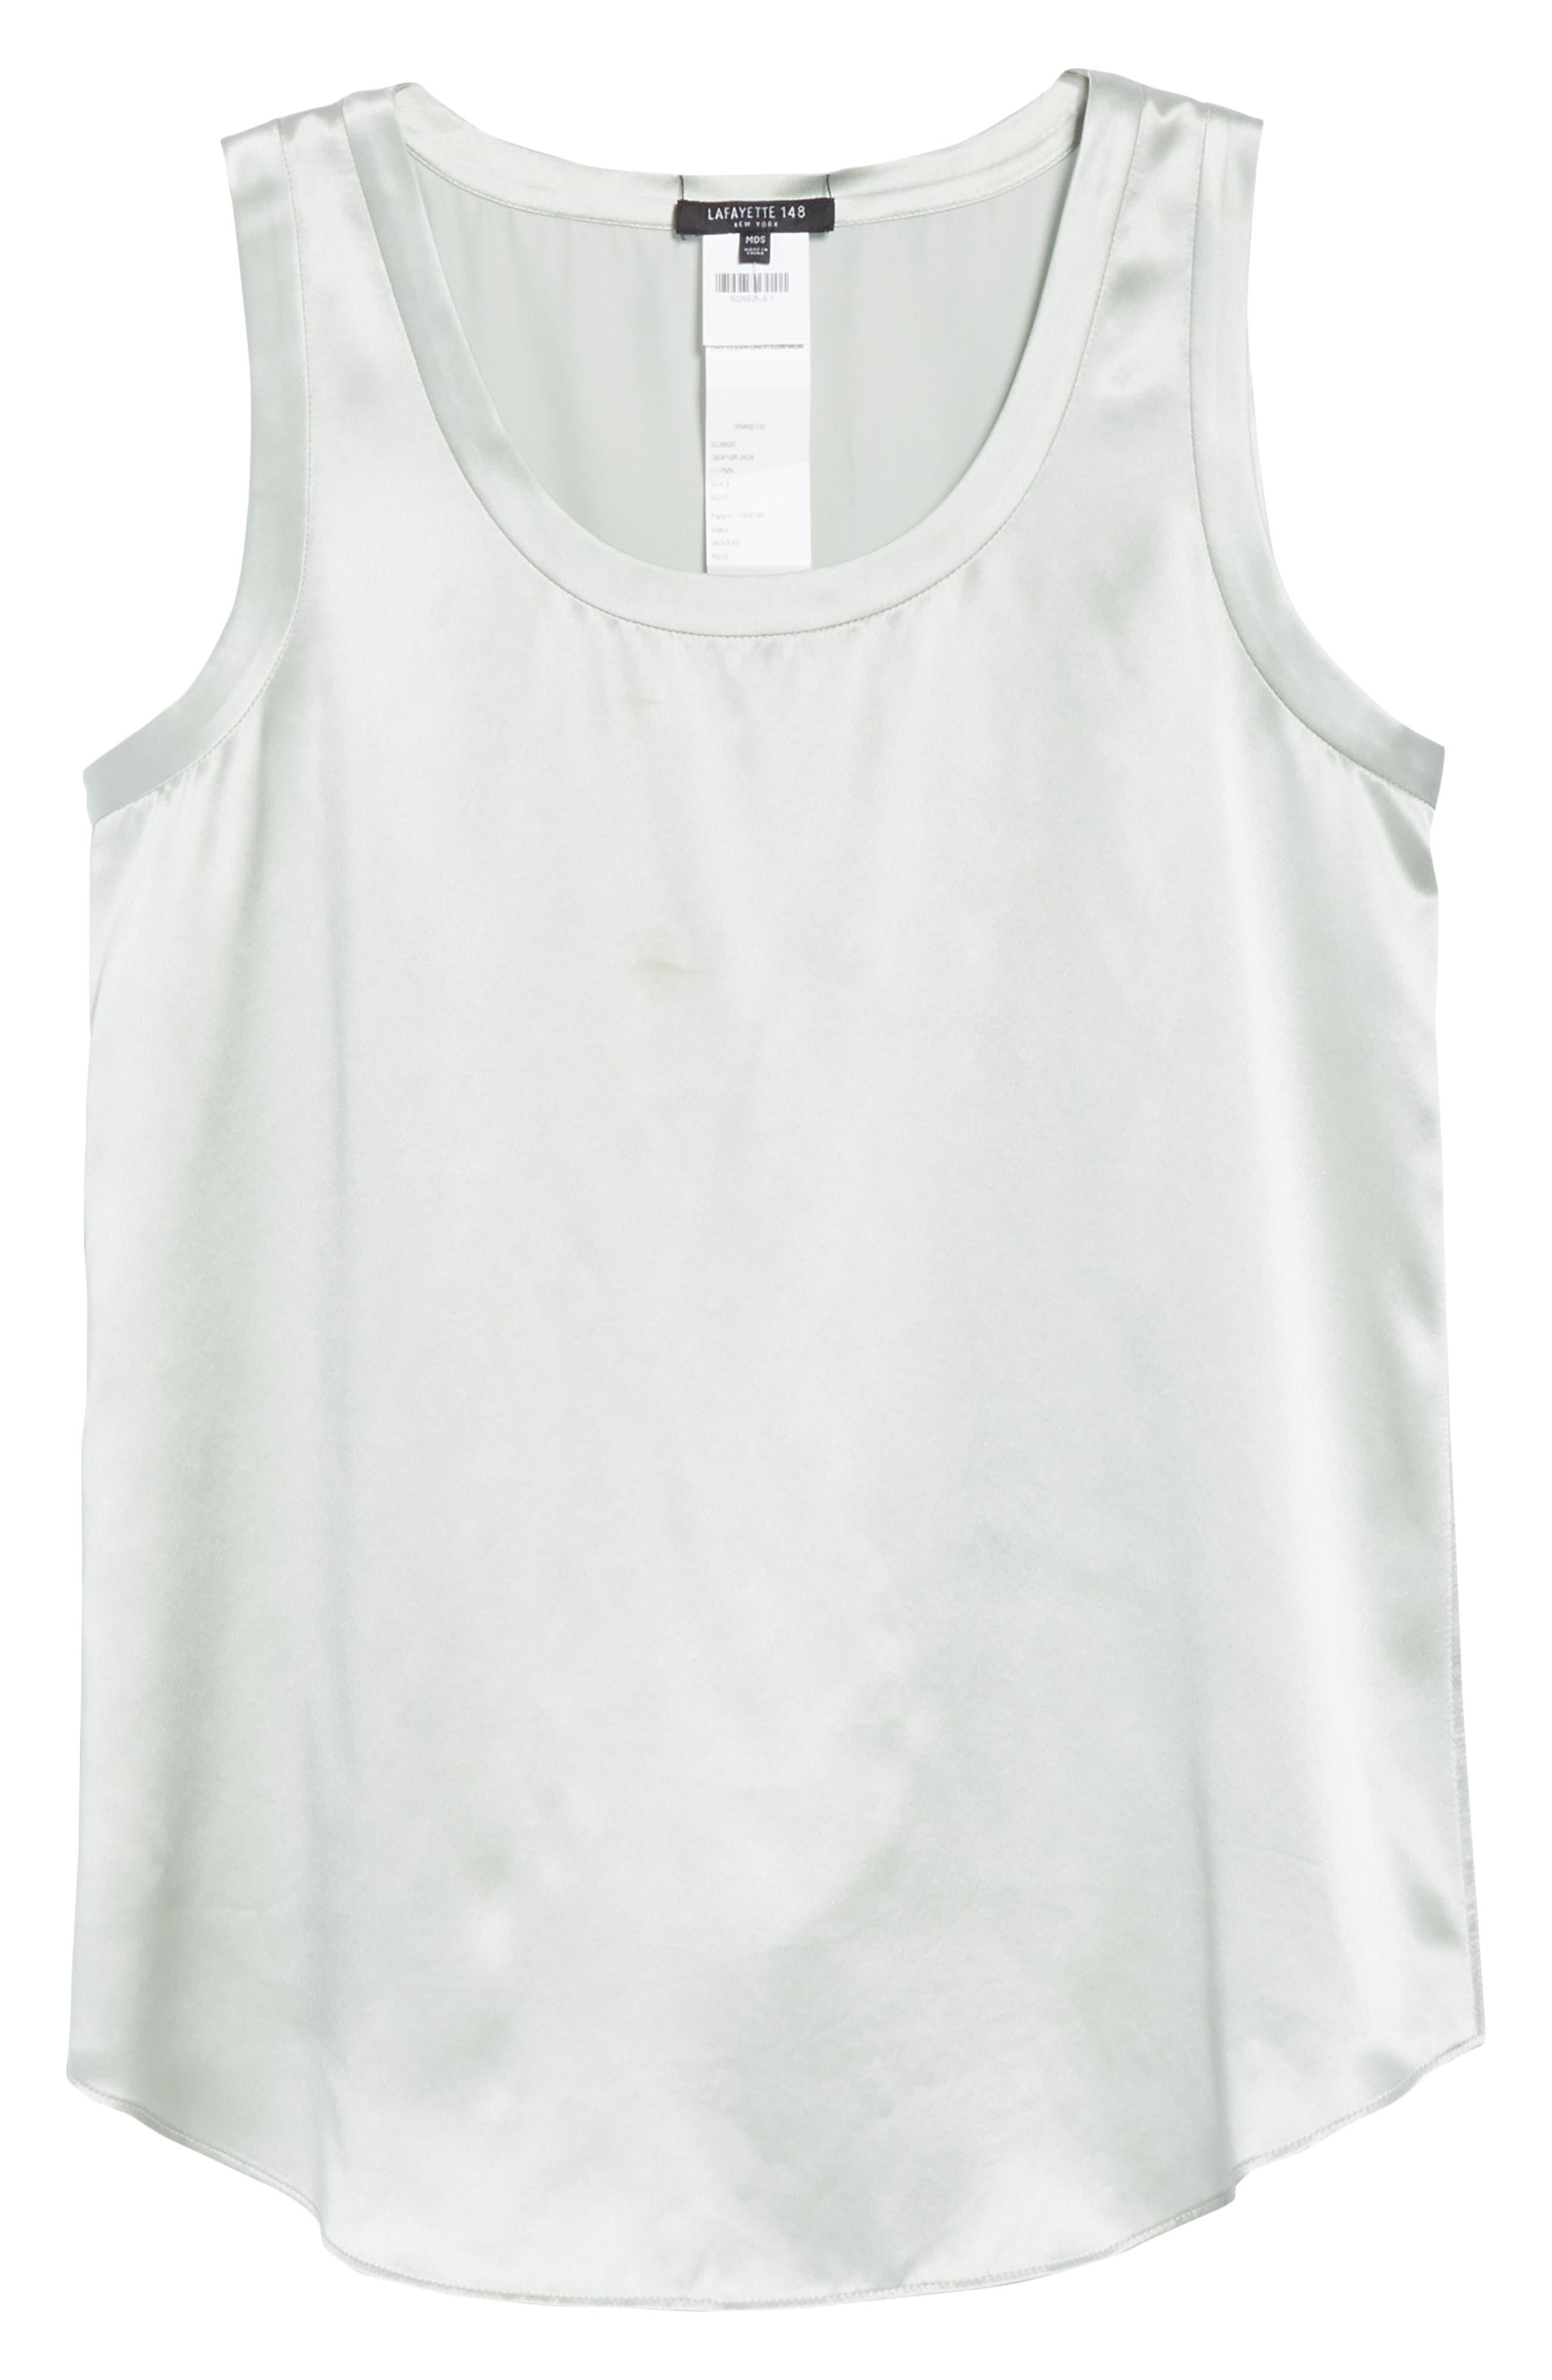 Perla Reversible Silk Blouse,                             Alternate thumbnail 8, color,                             302